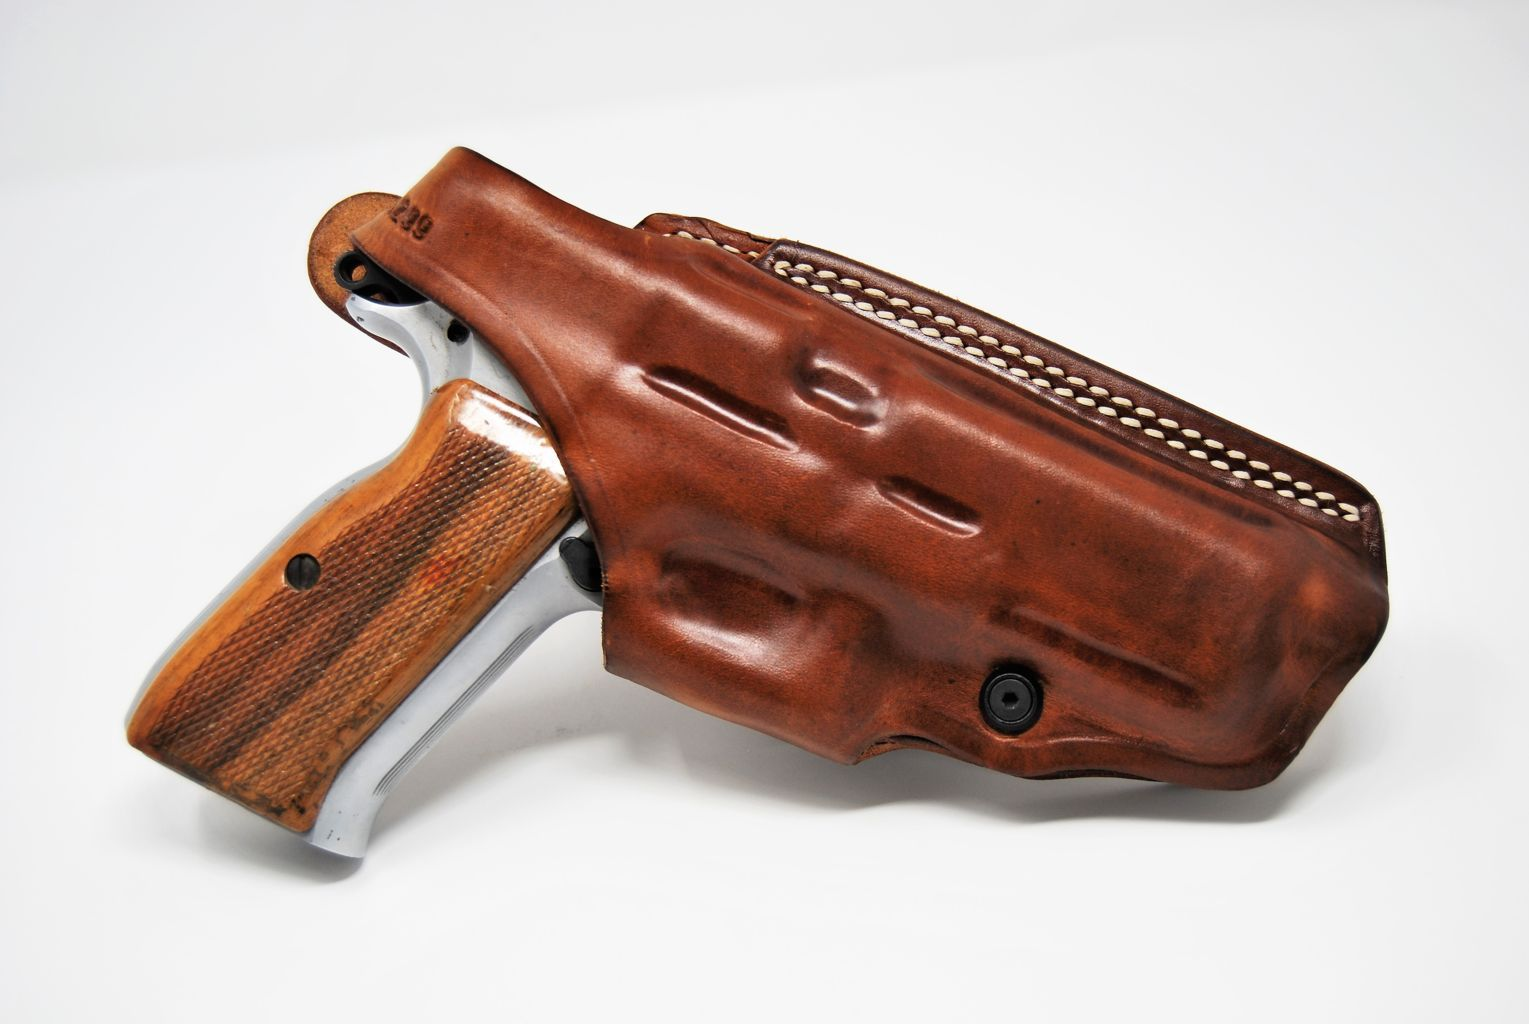 Fondina in cuoio per Glock 17/22/31; SIG SAUER P220/225/226/228/229 FD16 SA299